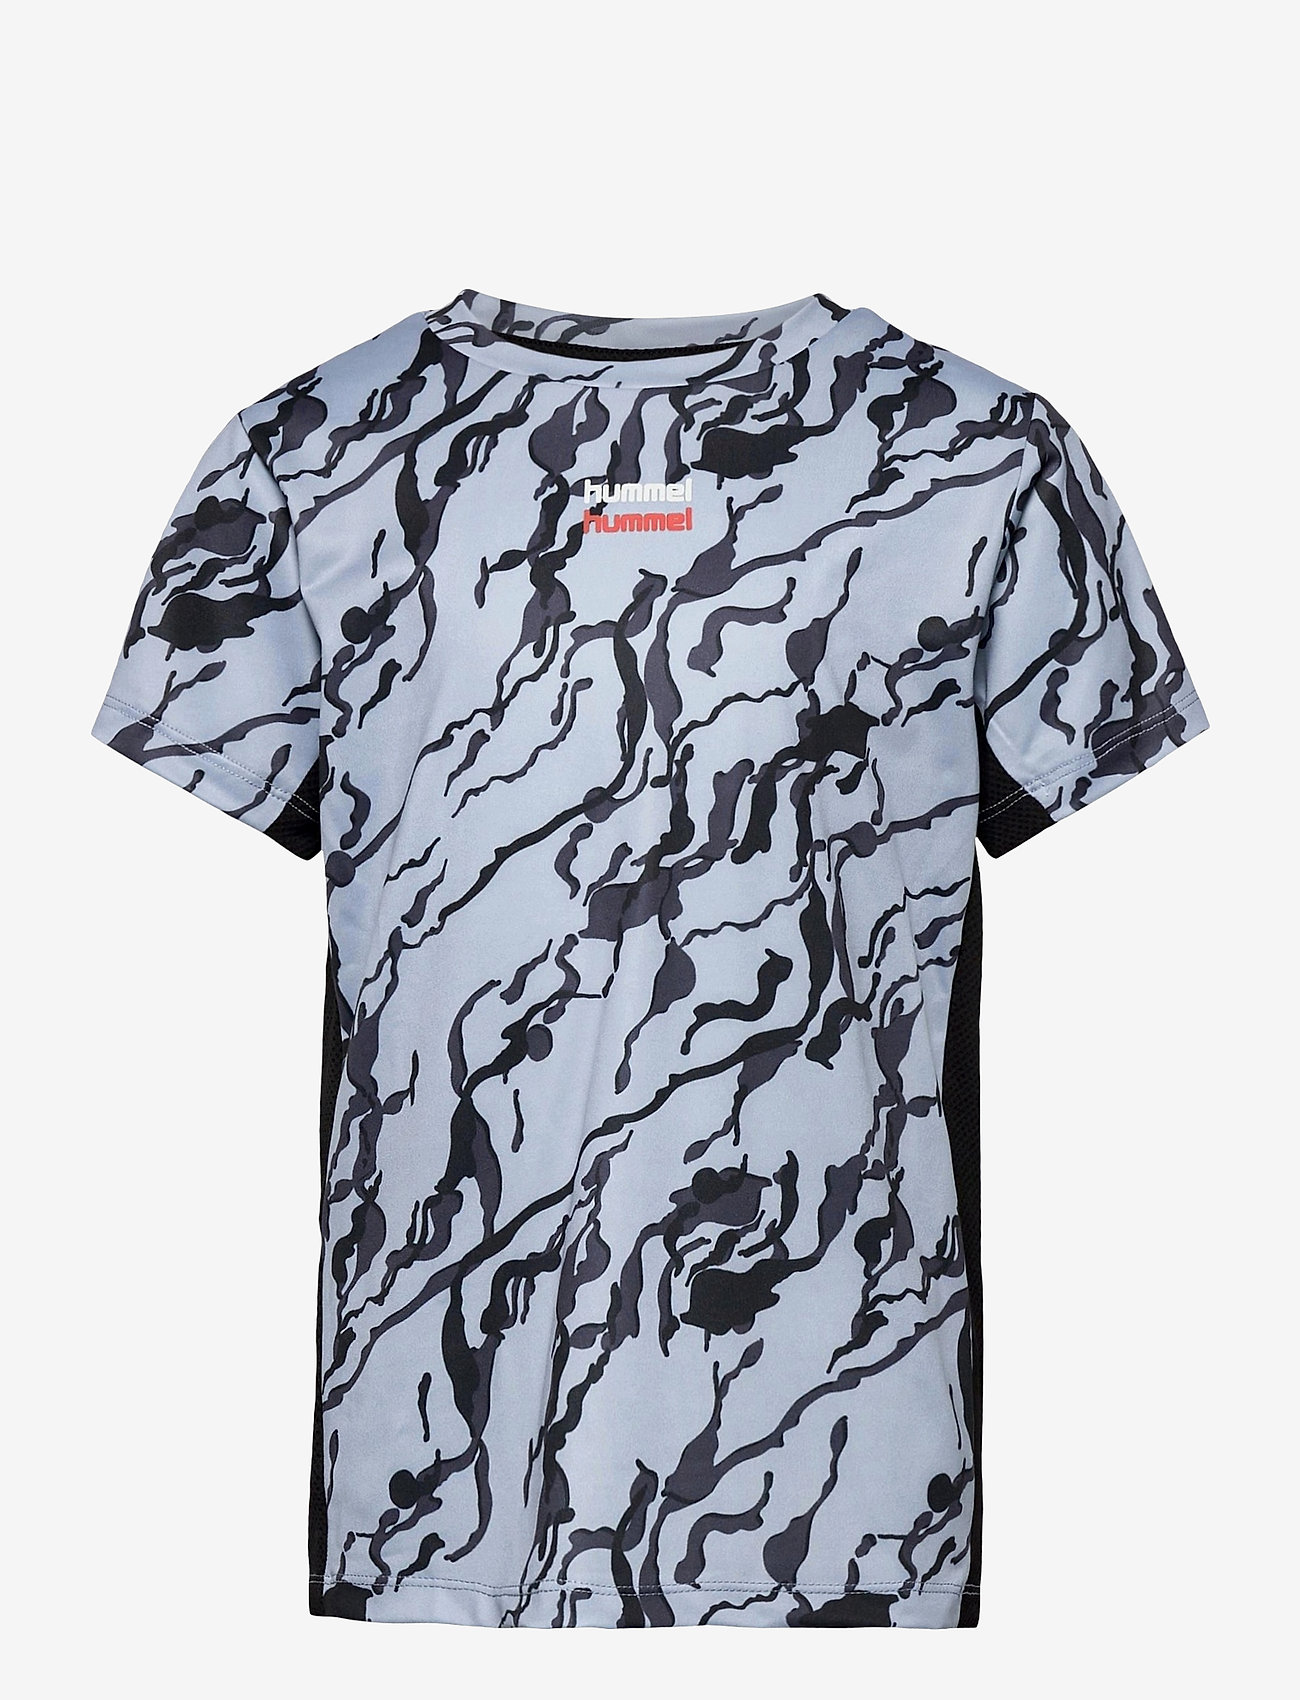 Hummel - hmlNOAH T-SHIRT S/S - short-sleeved - blue fog - 0